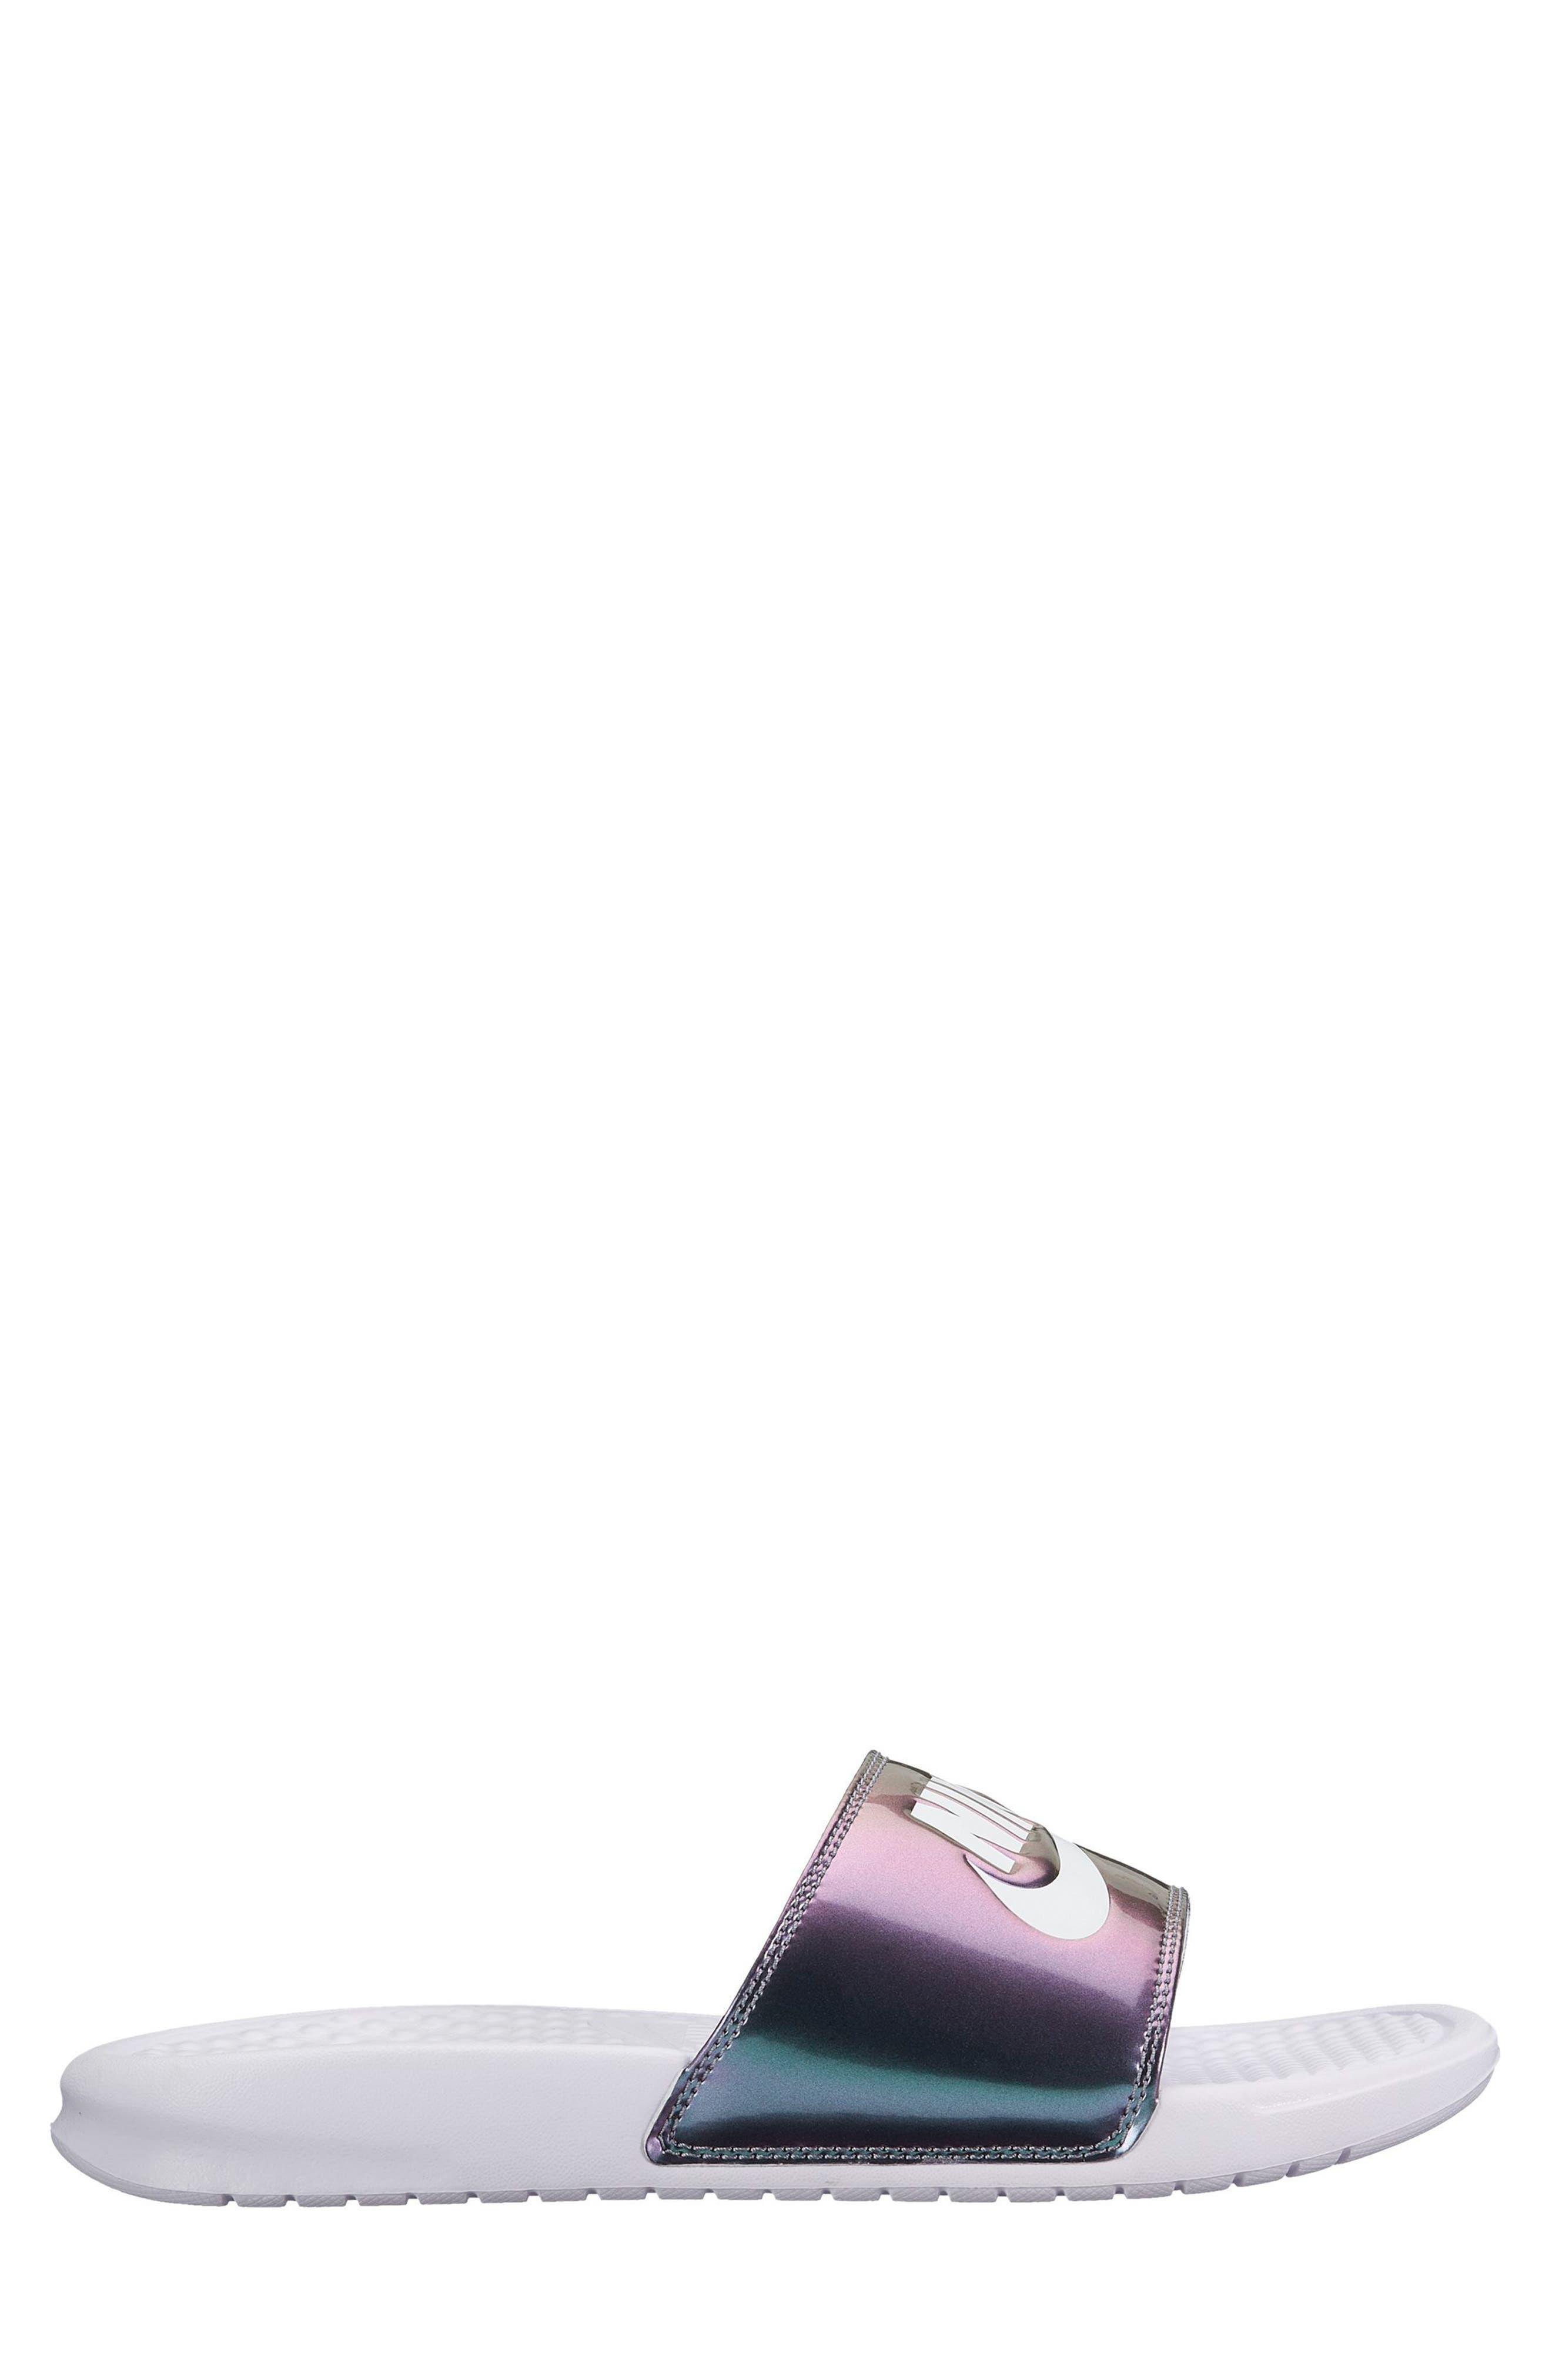 Nike Benassi Just Do It Print Sandal (Women)